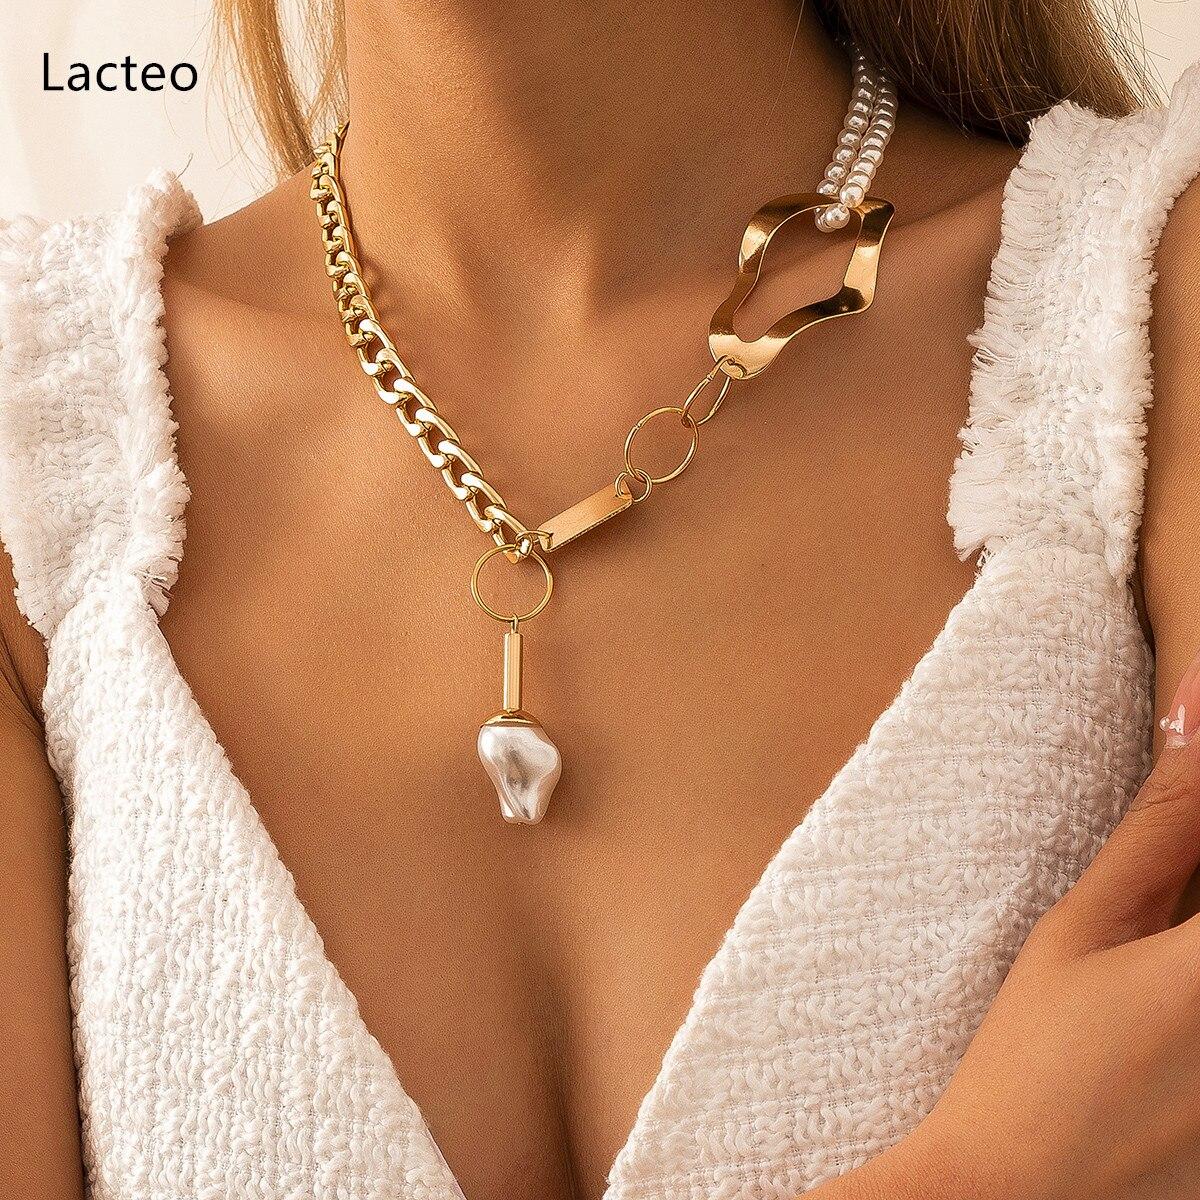 Lacteo Bohemian Irregular Imitation Pearls Pendant Necklace Jewelry Steampunk Asymmetric Cuban Chain Choker Gifts